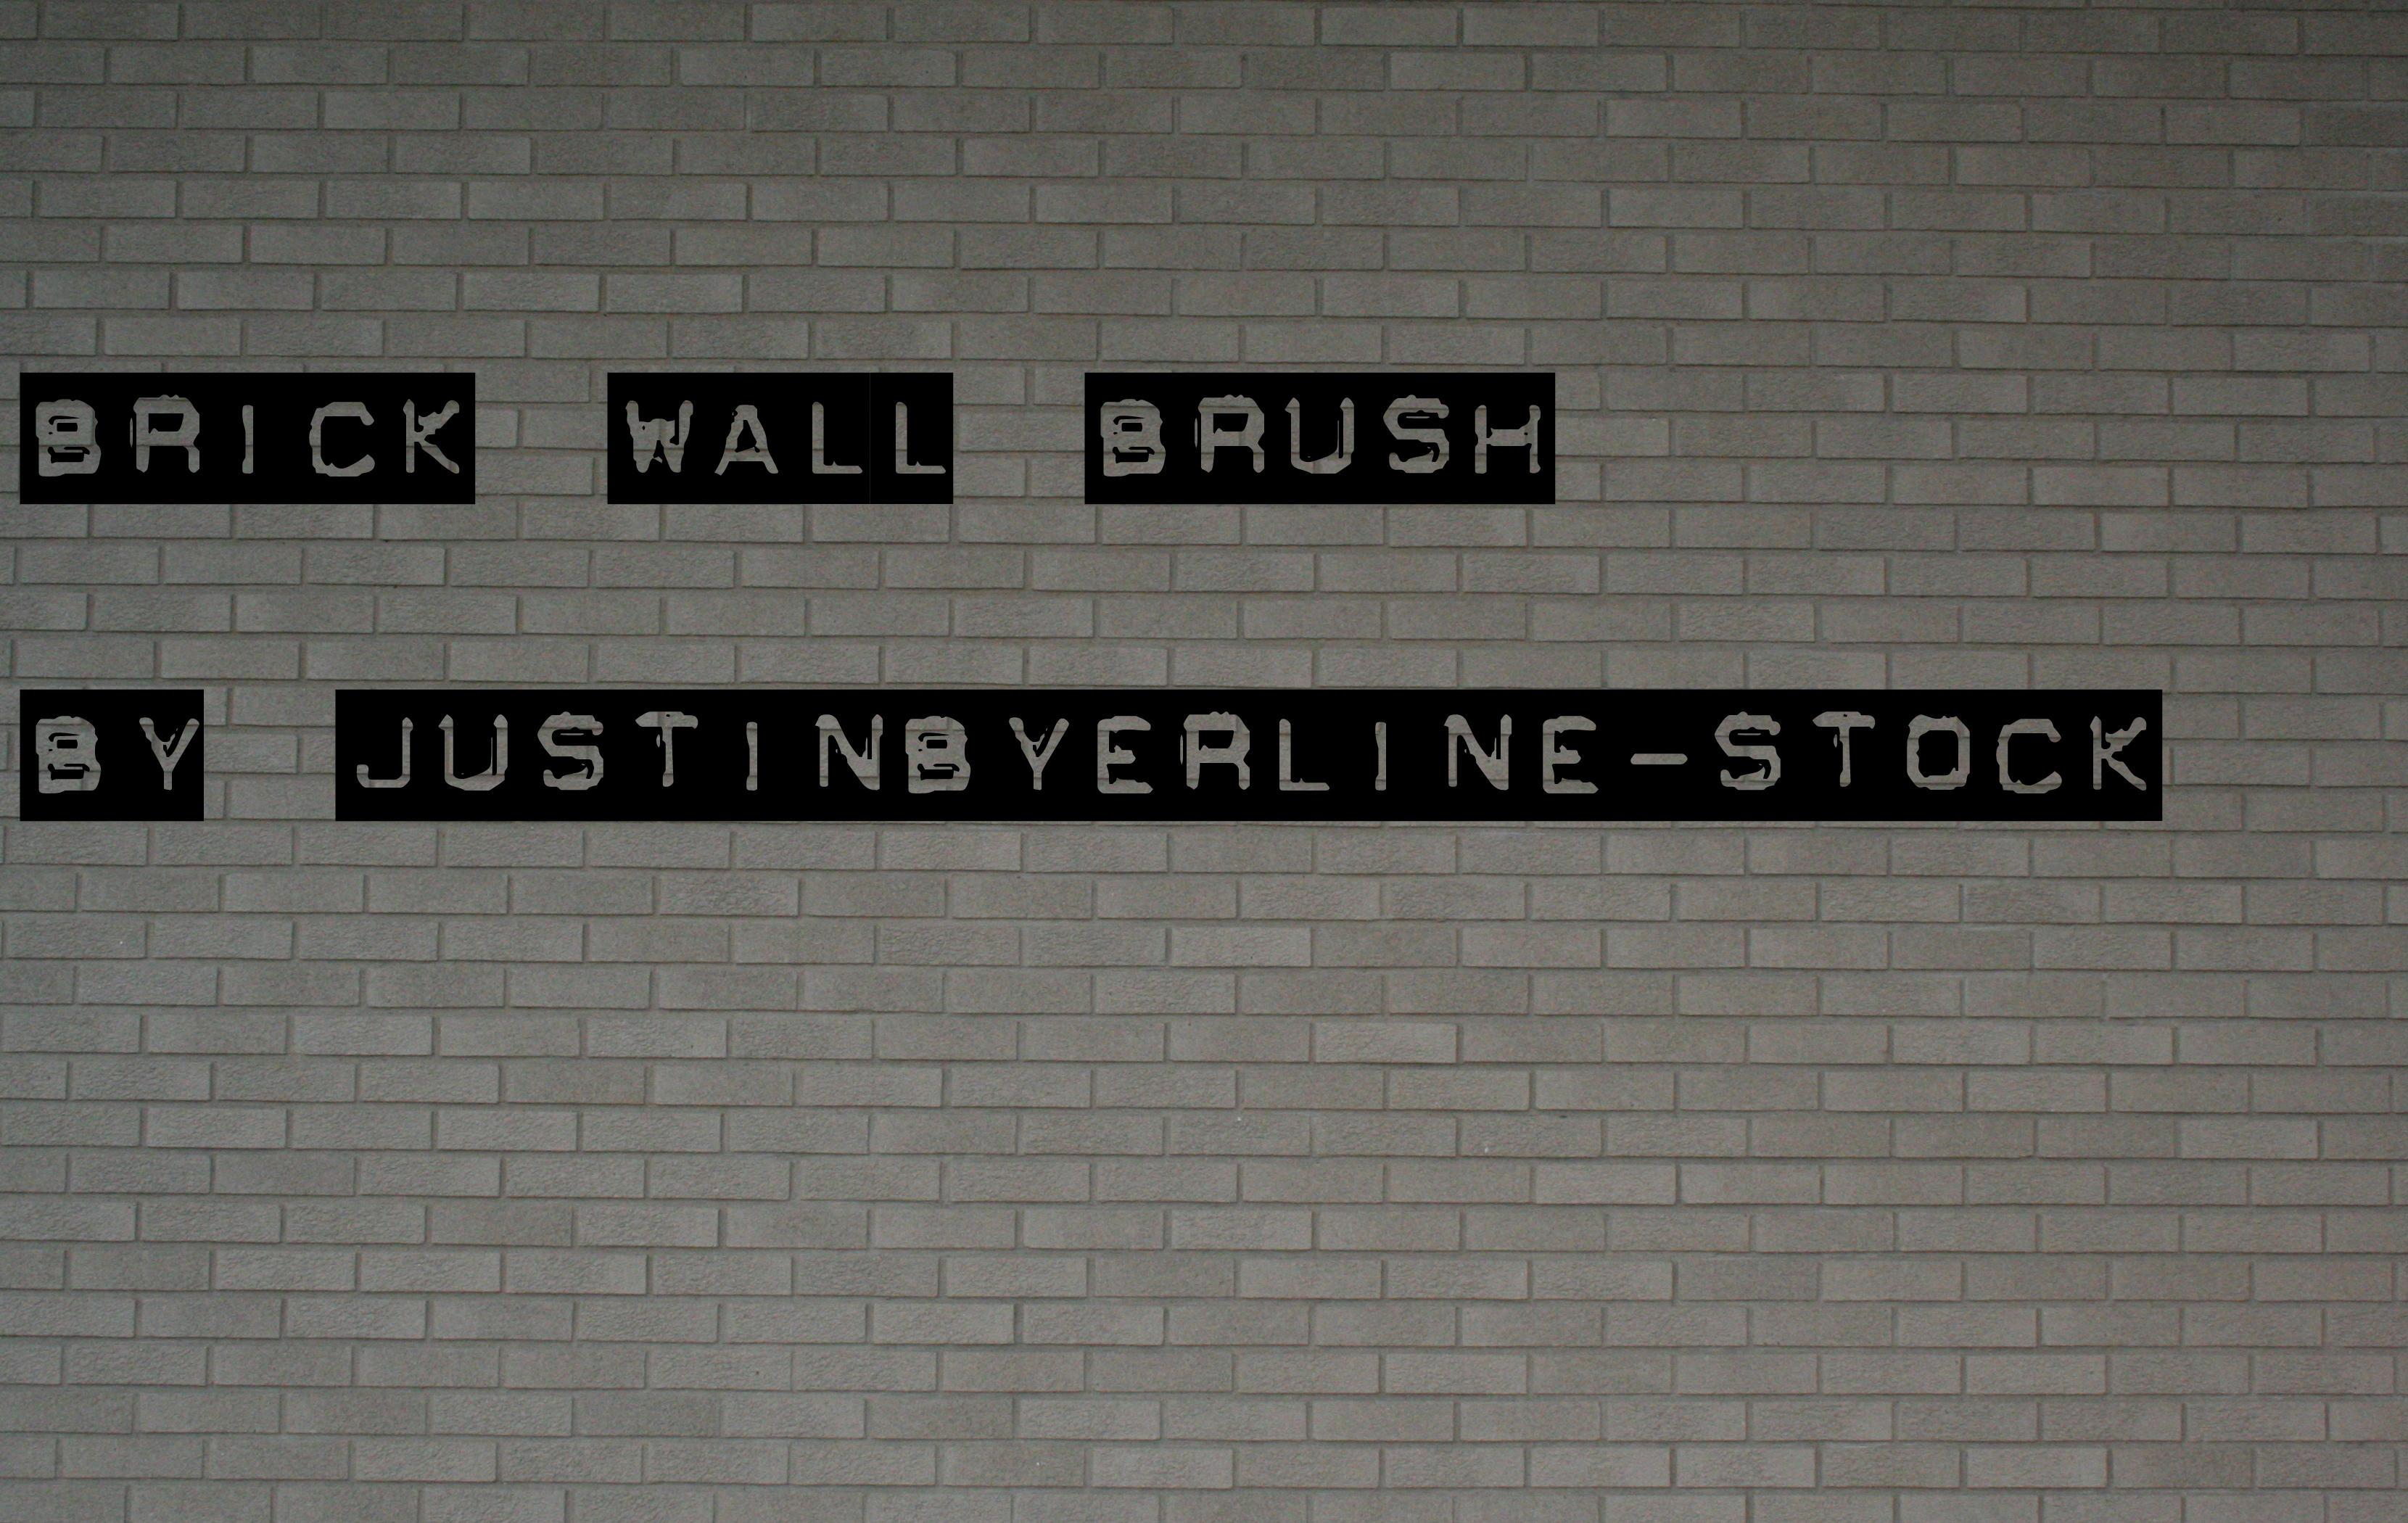 Brickwall Brush by JustinByerline-Stock